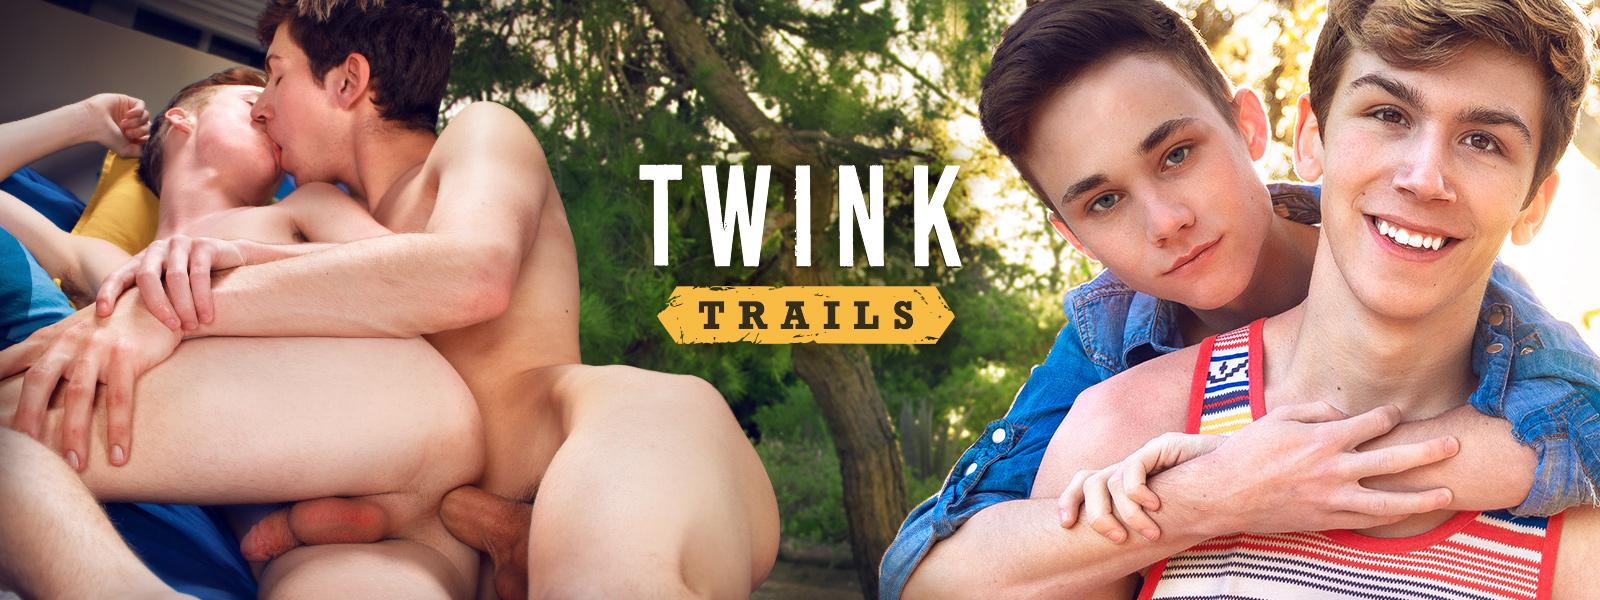 Twink Trails